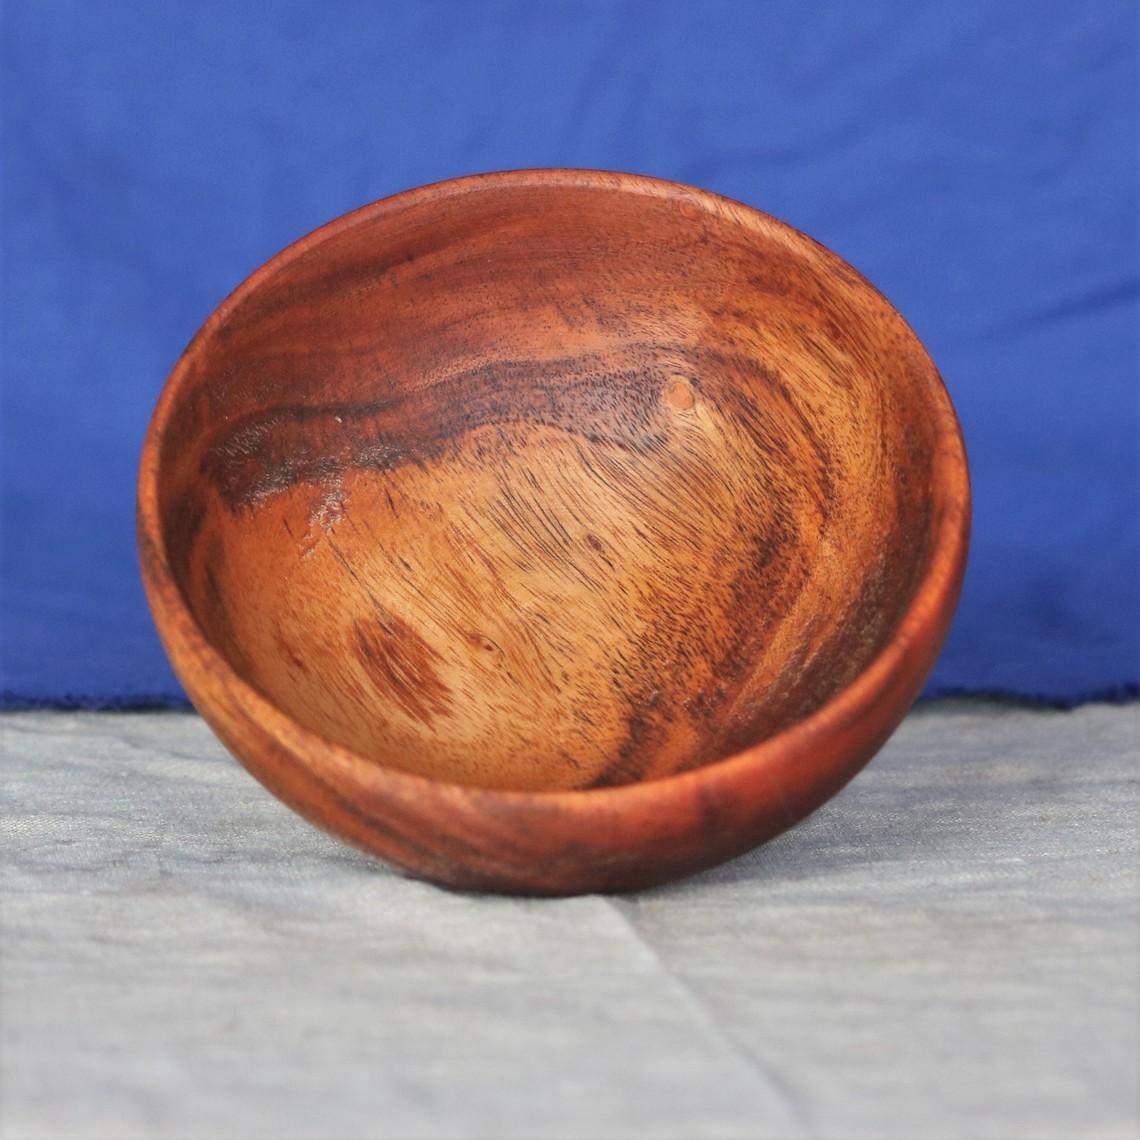 Mytholon Medievale ciotola in legno S